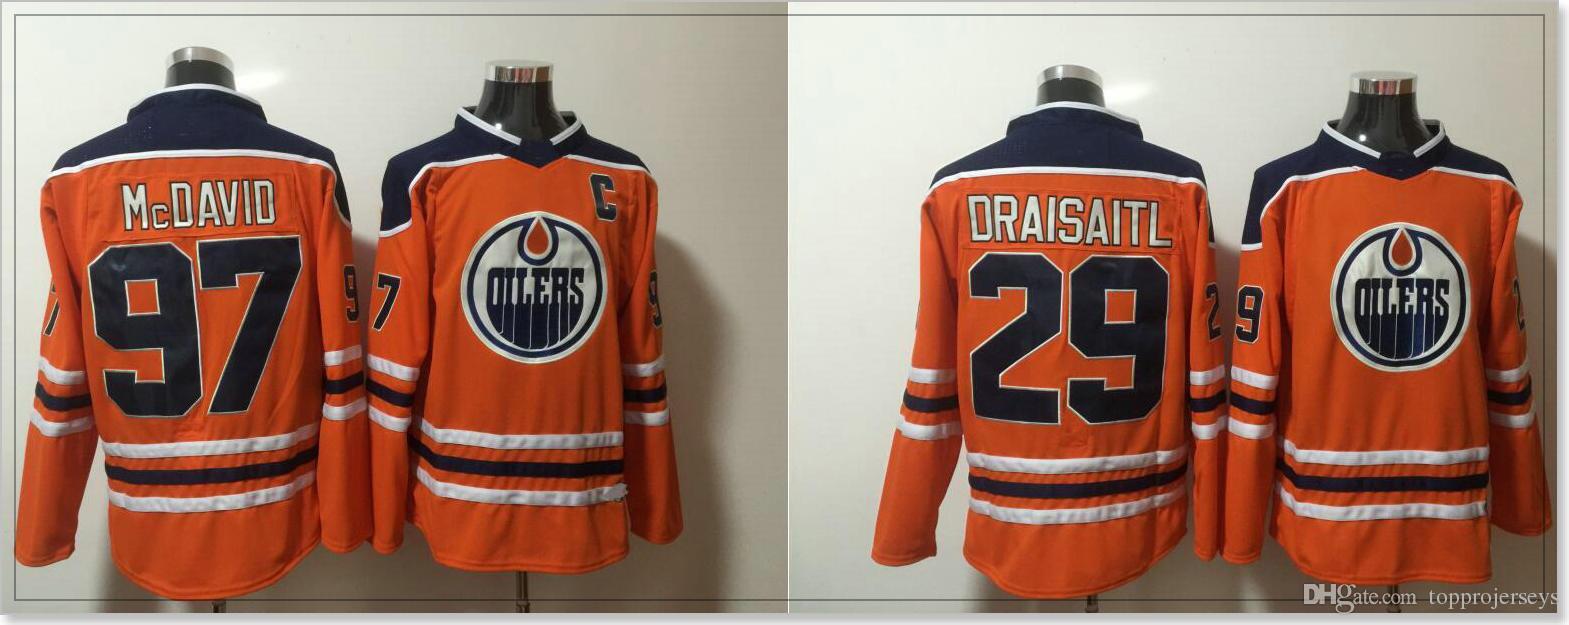 Edmonton Oilers #29 Leon Draisaitl 97 Connor McDavid Mens Ice Hockey Shirts Team Sports Jerseys Uniforms Cheap Stitched Embroidery On Sale